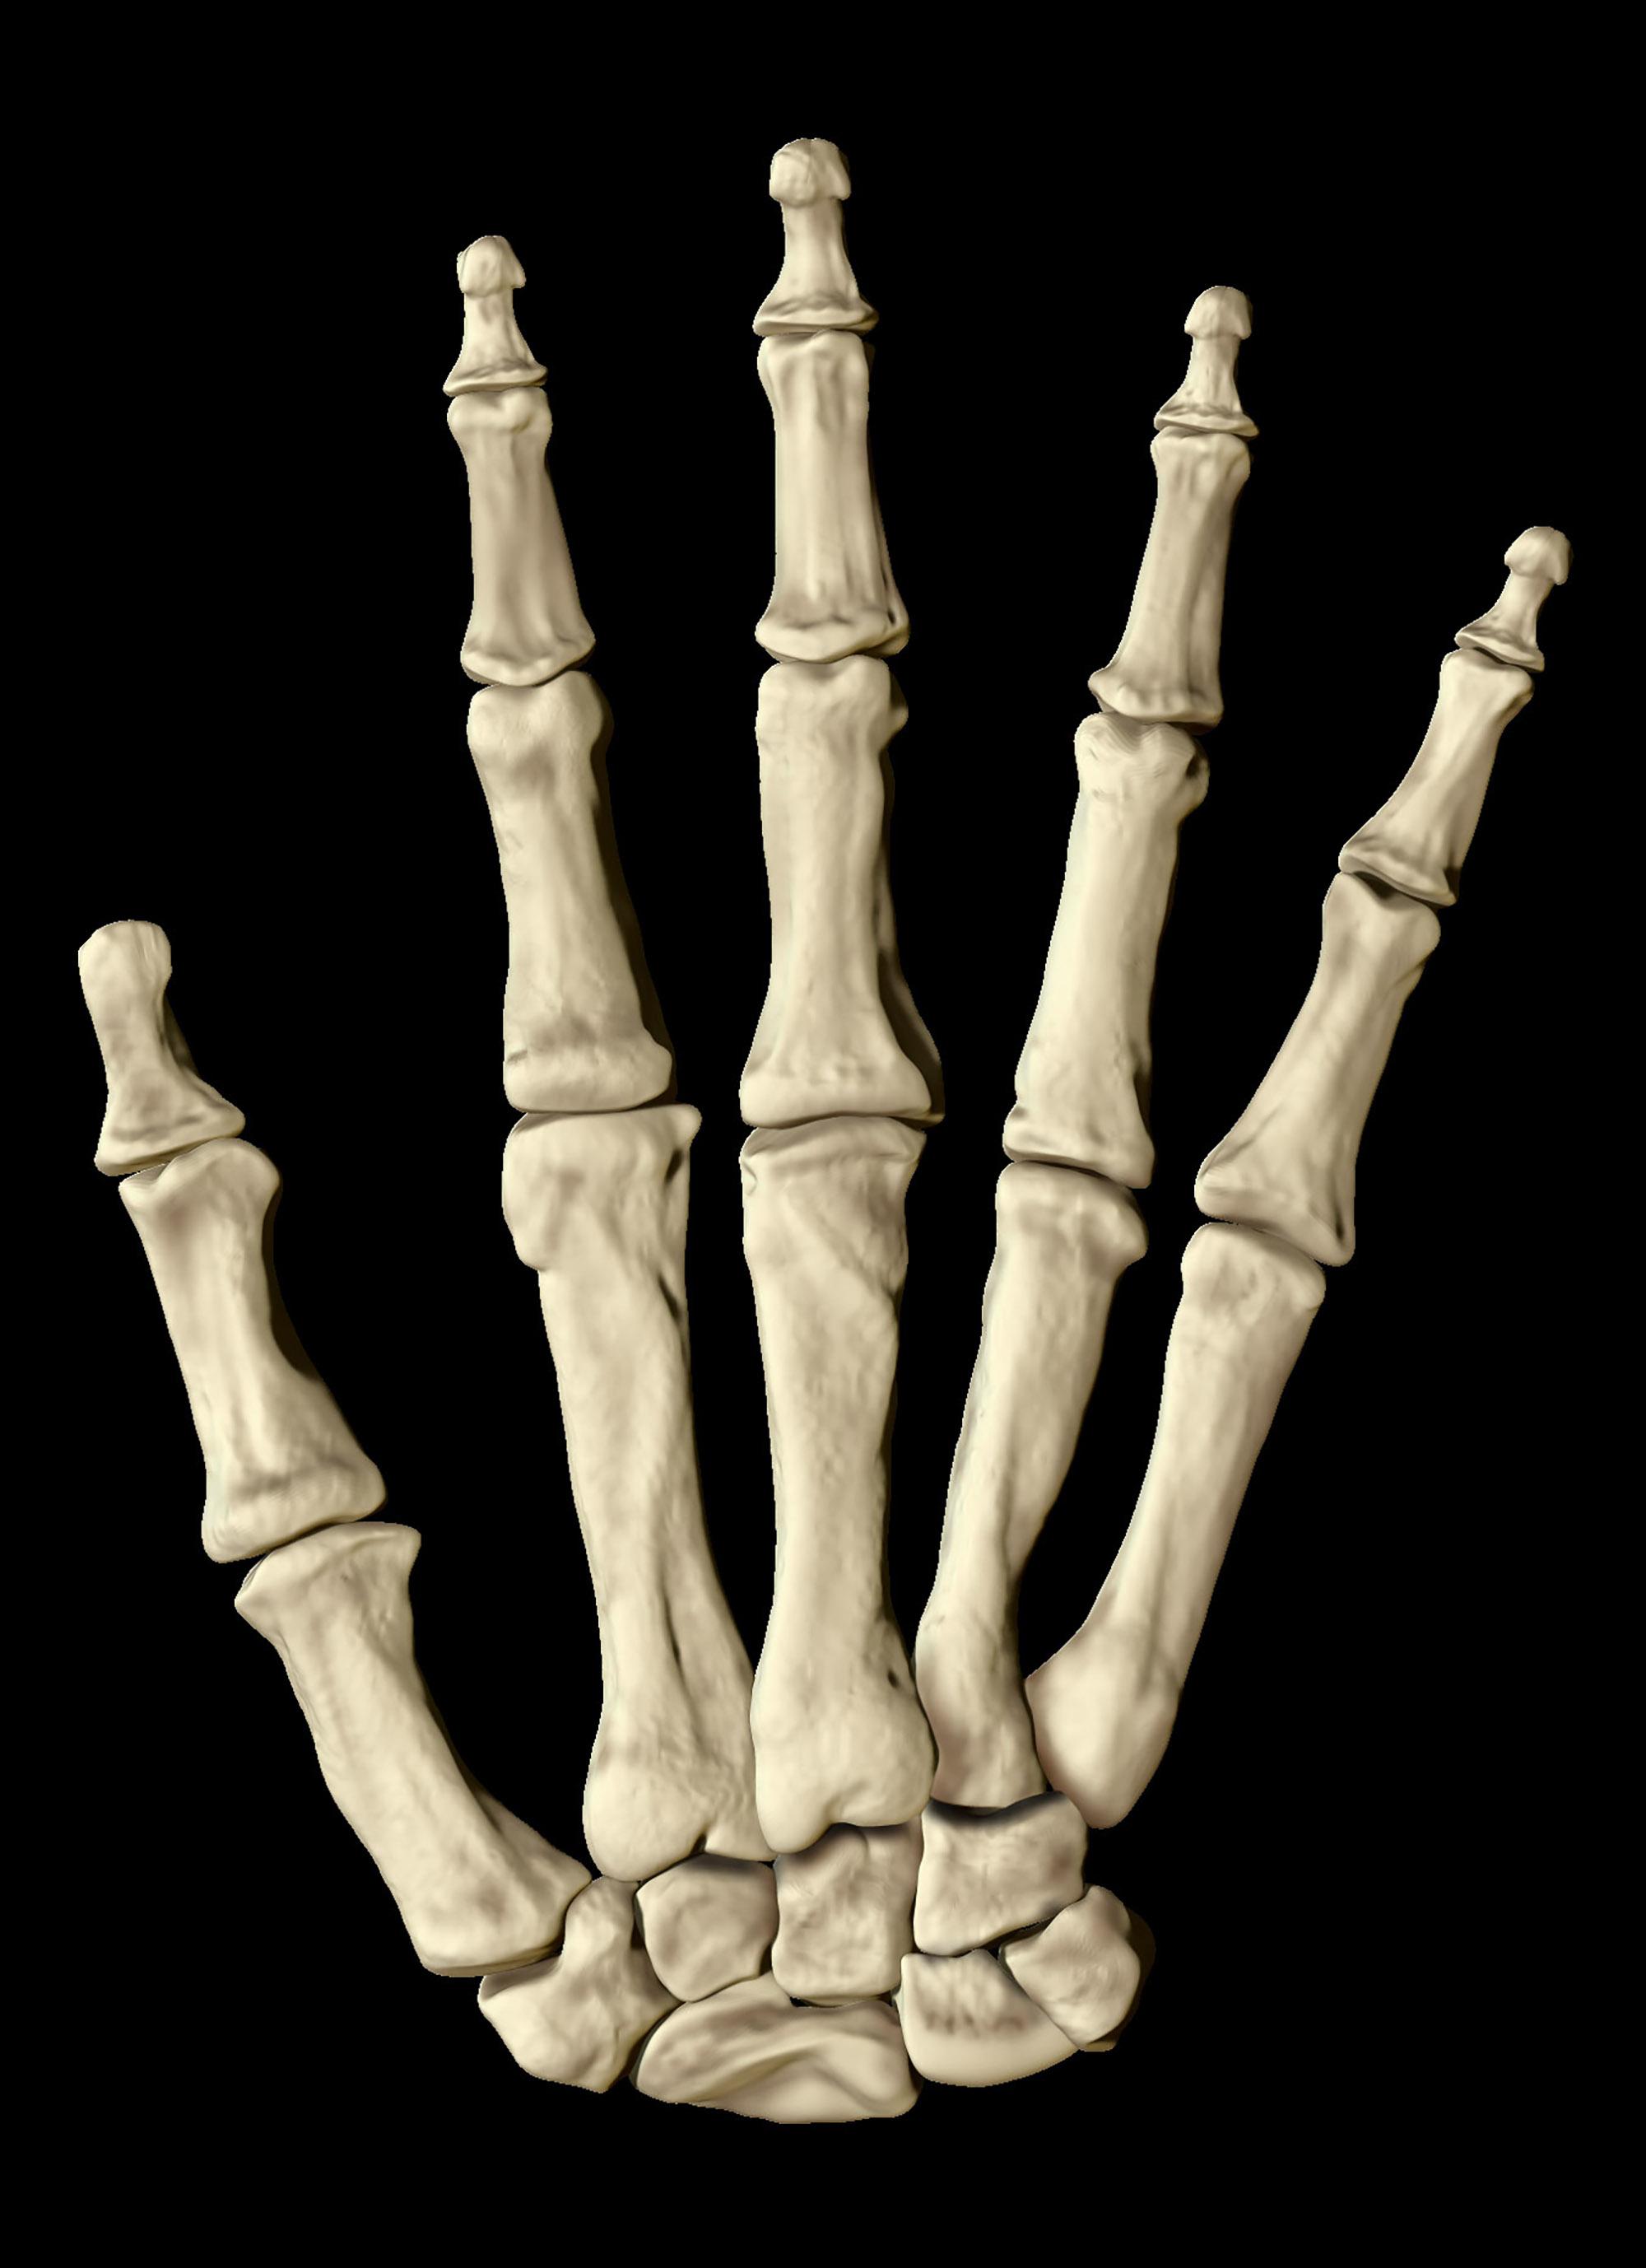 Hand Bones, 3D Model